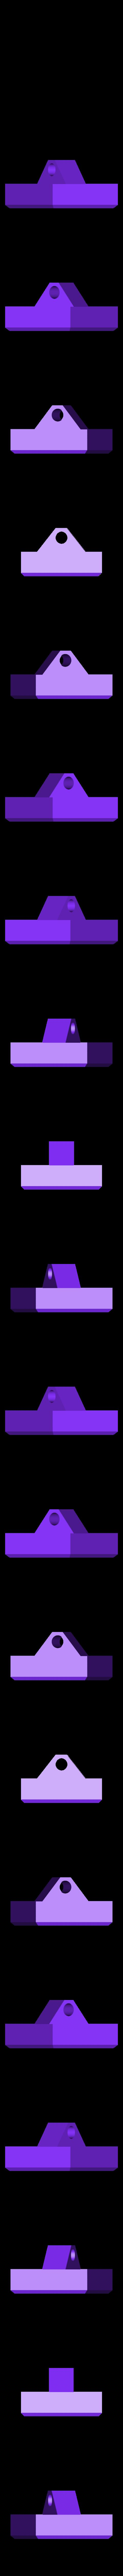 welding_test.stl Download free STL file Welding 3D prints with 3D pen sample for test • Model to 3D print, NikodemBartnik